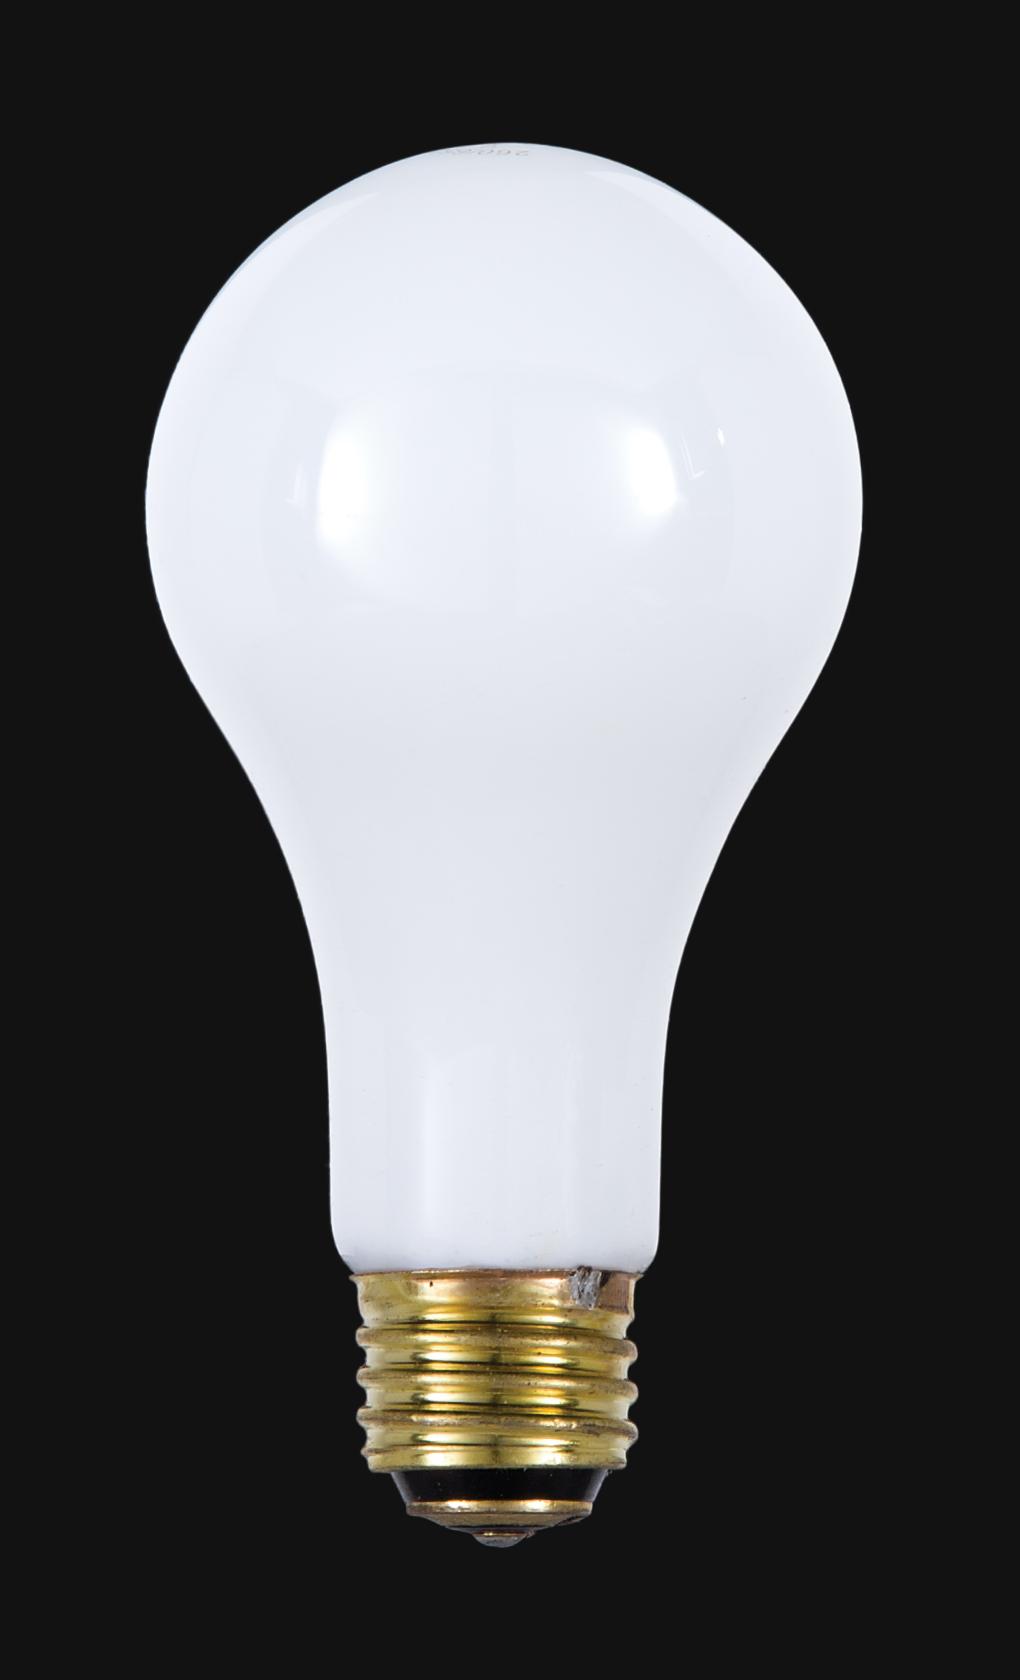 bulb - photo #16